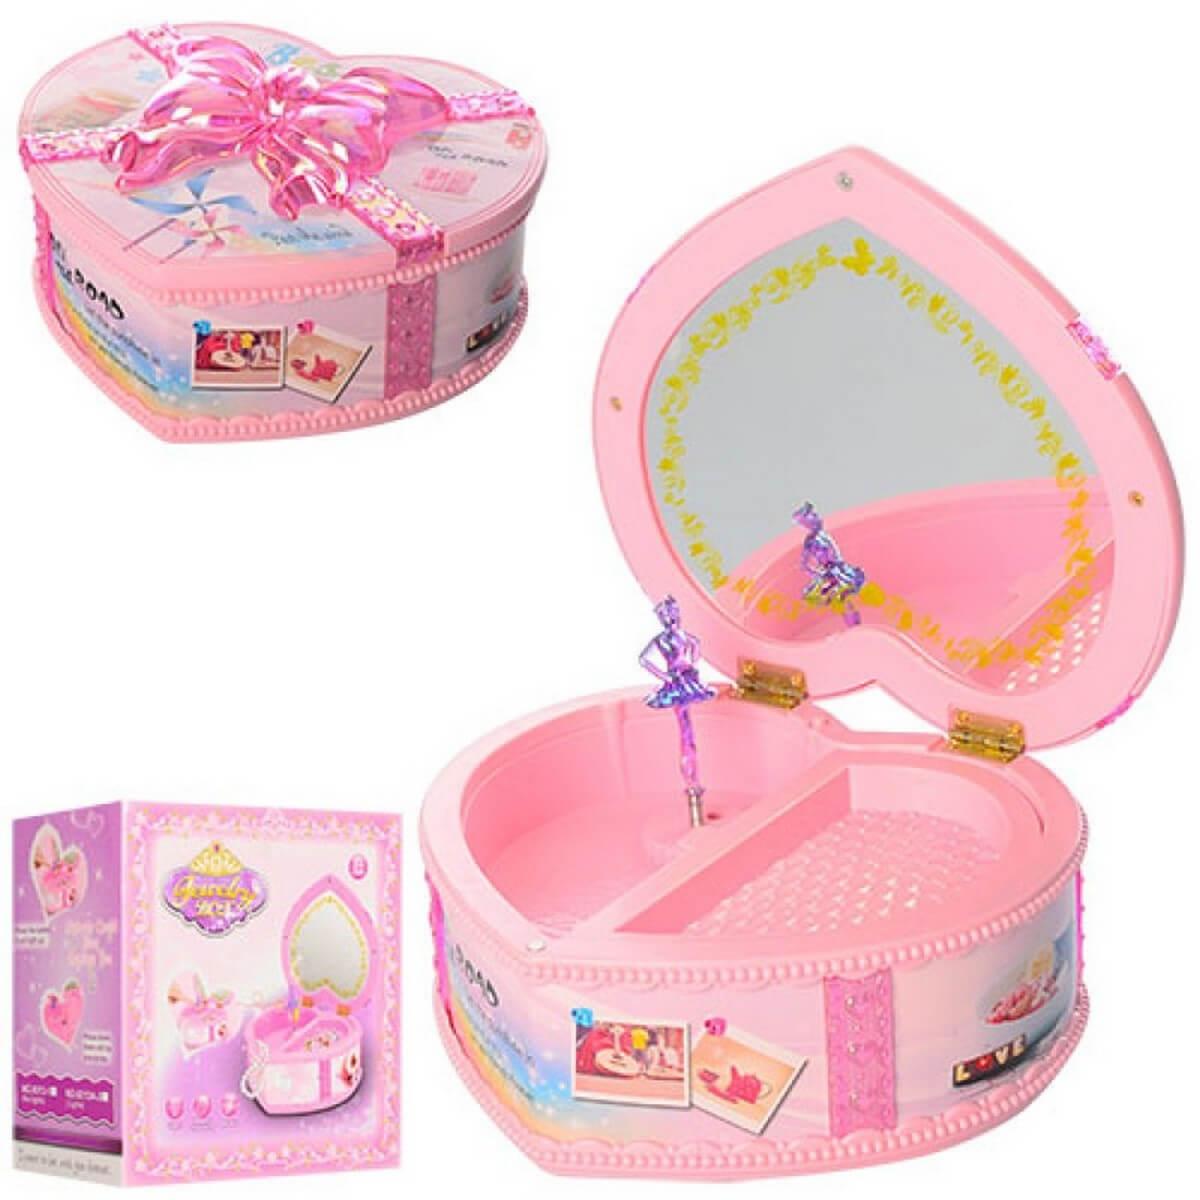 bk toys ltd. Шкатулка заводная «Сердце» 9213-1